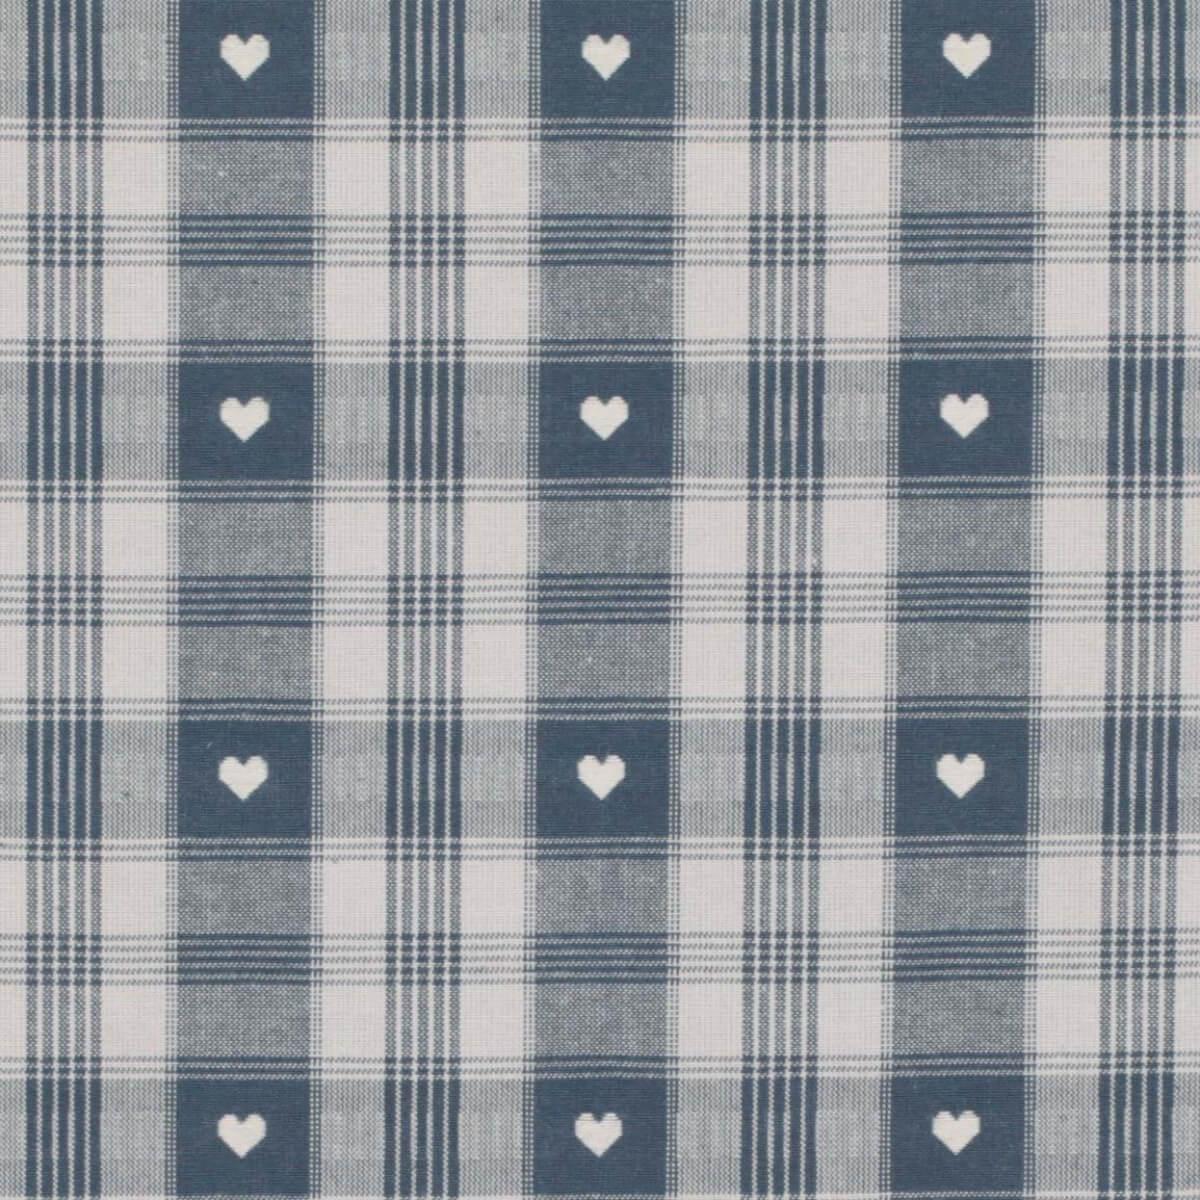 tissu coton traditionnel alsacien montagne bleu merceriecar. Black Bedroom Furniture Sets. Home Design Ideas